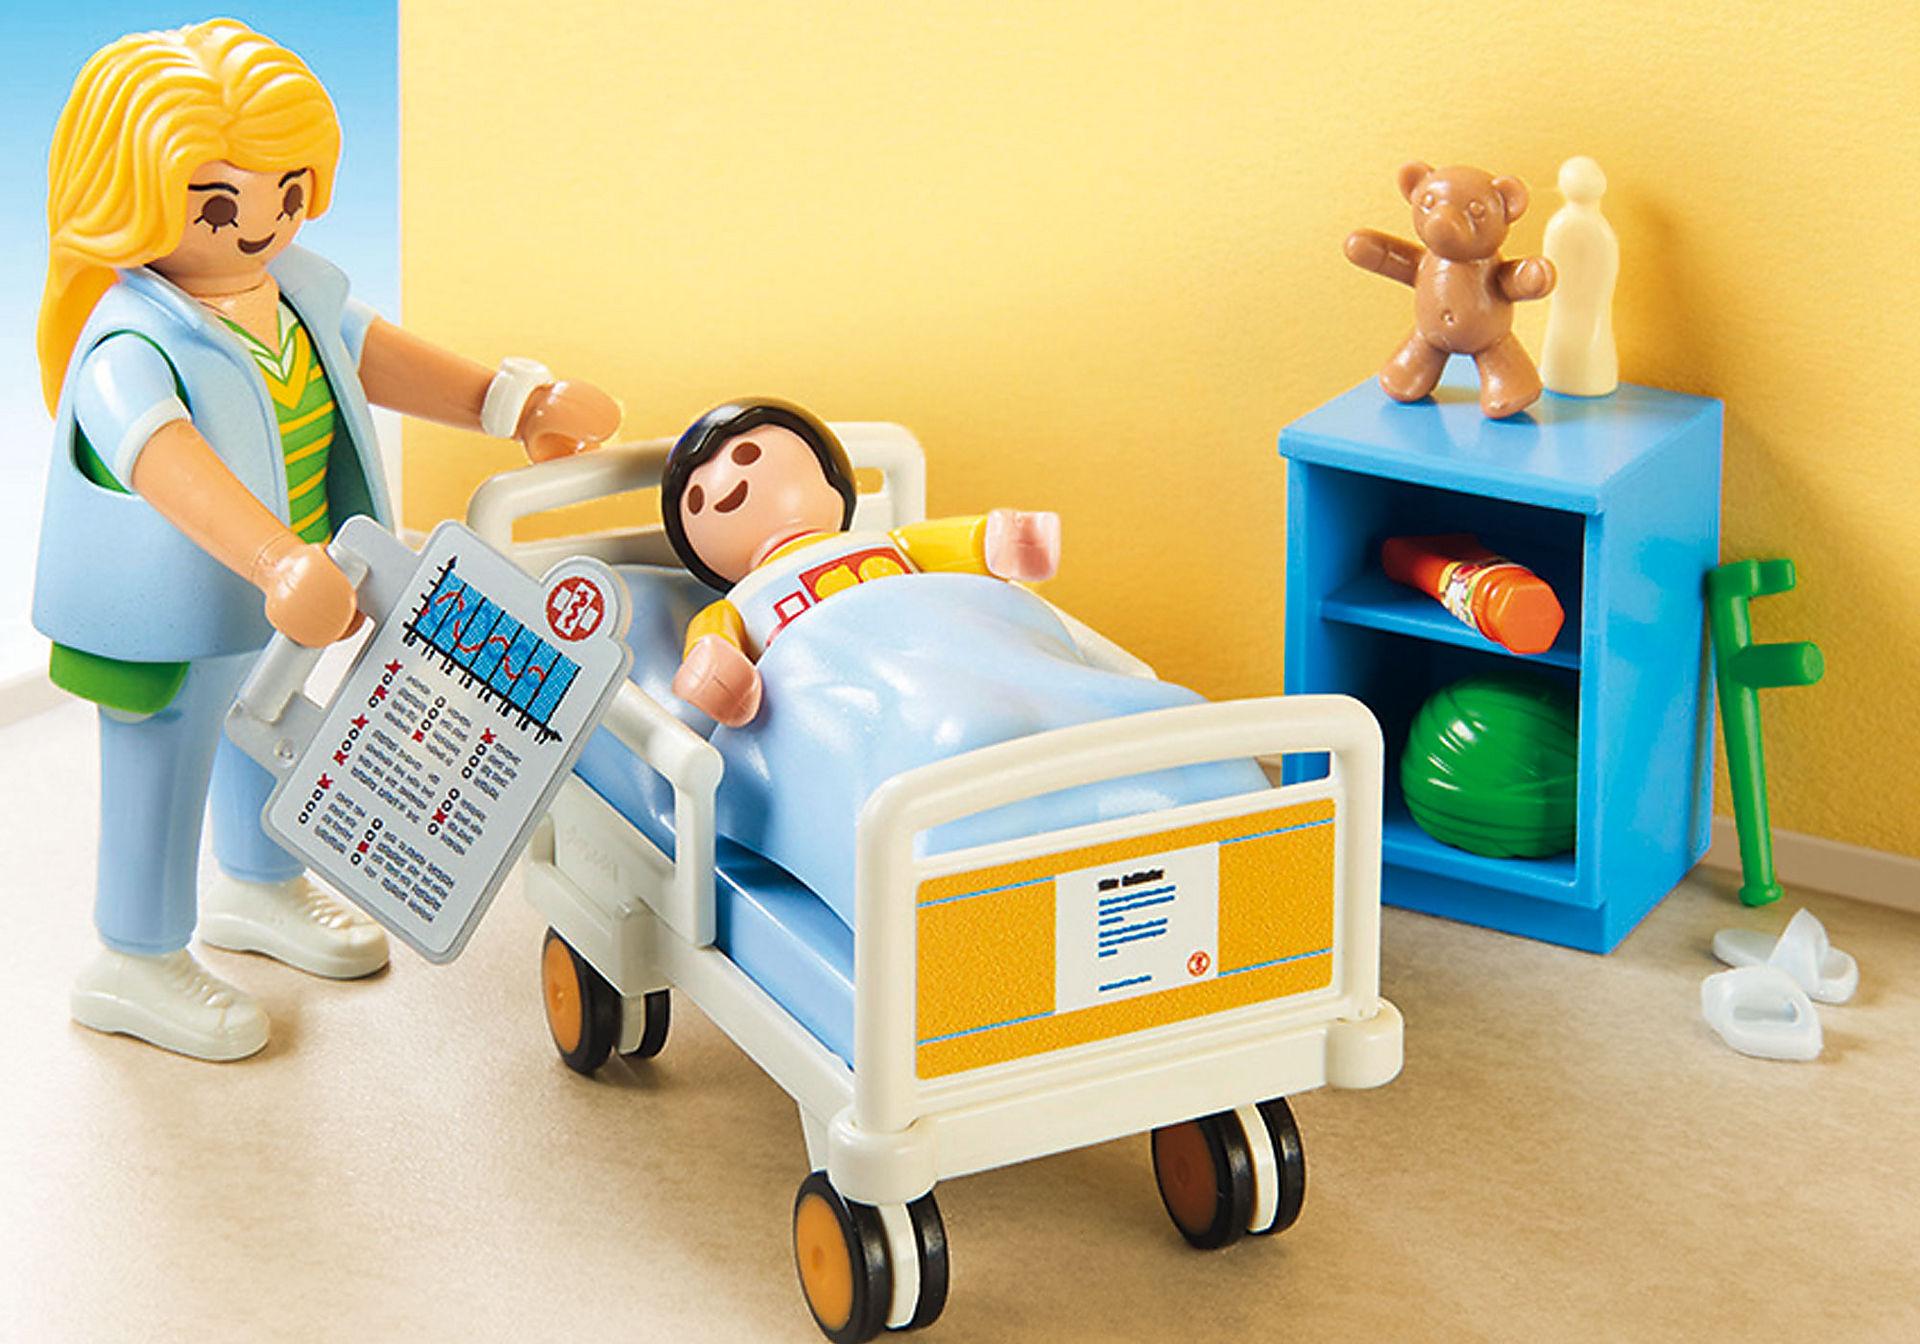 70192 Kinderziekenhuiskamer zoom image5